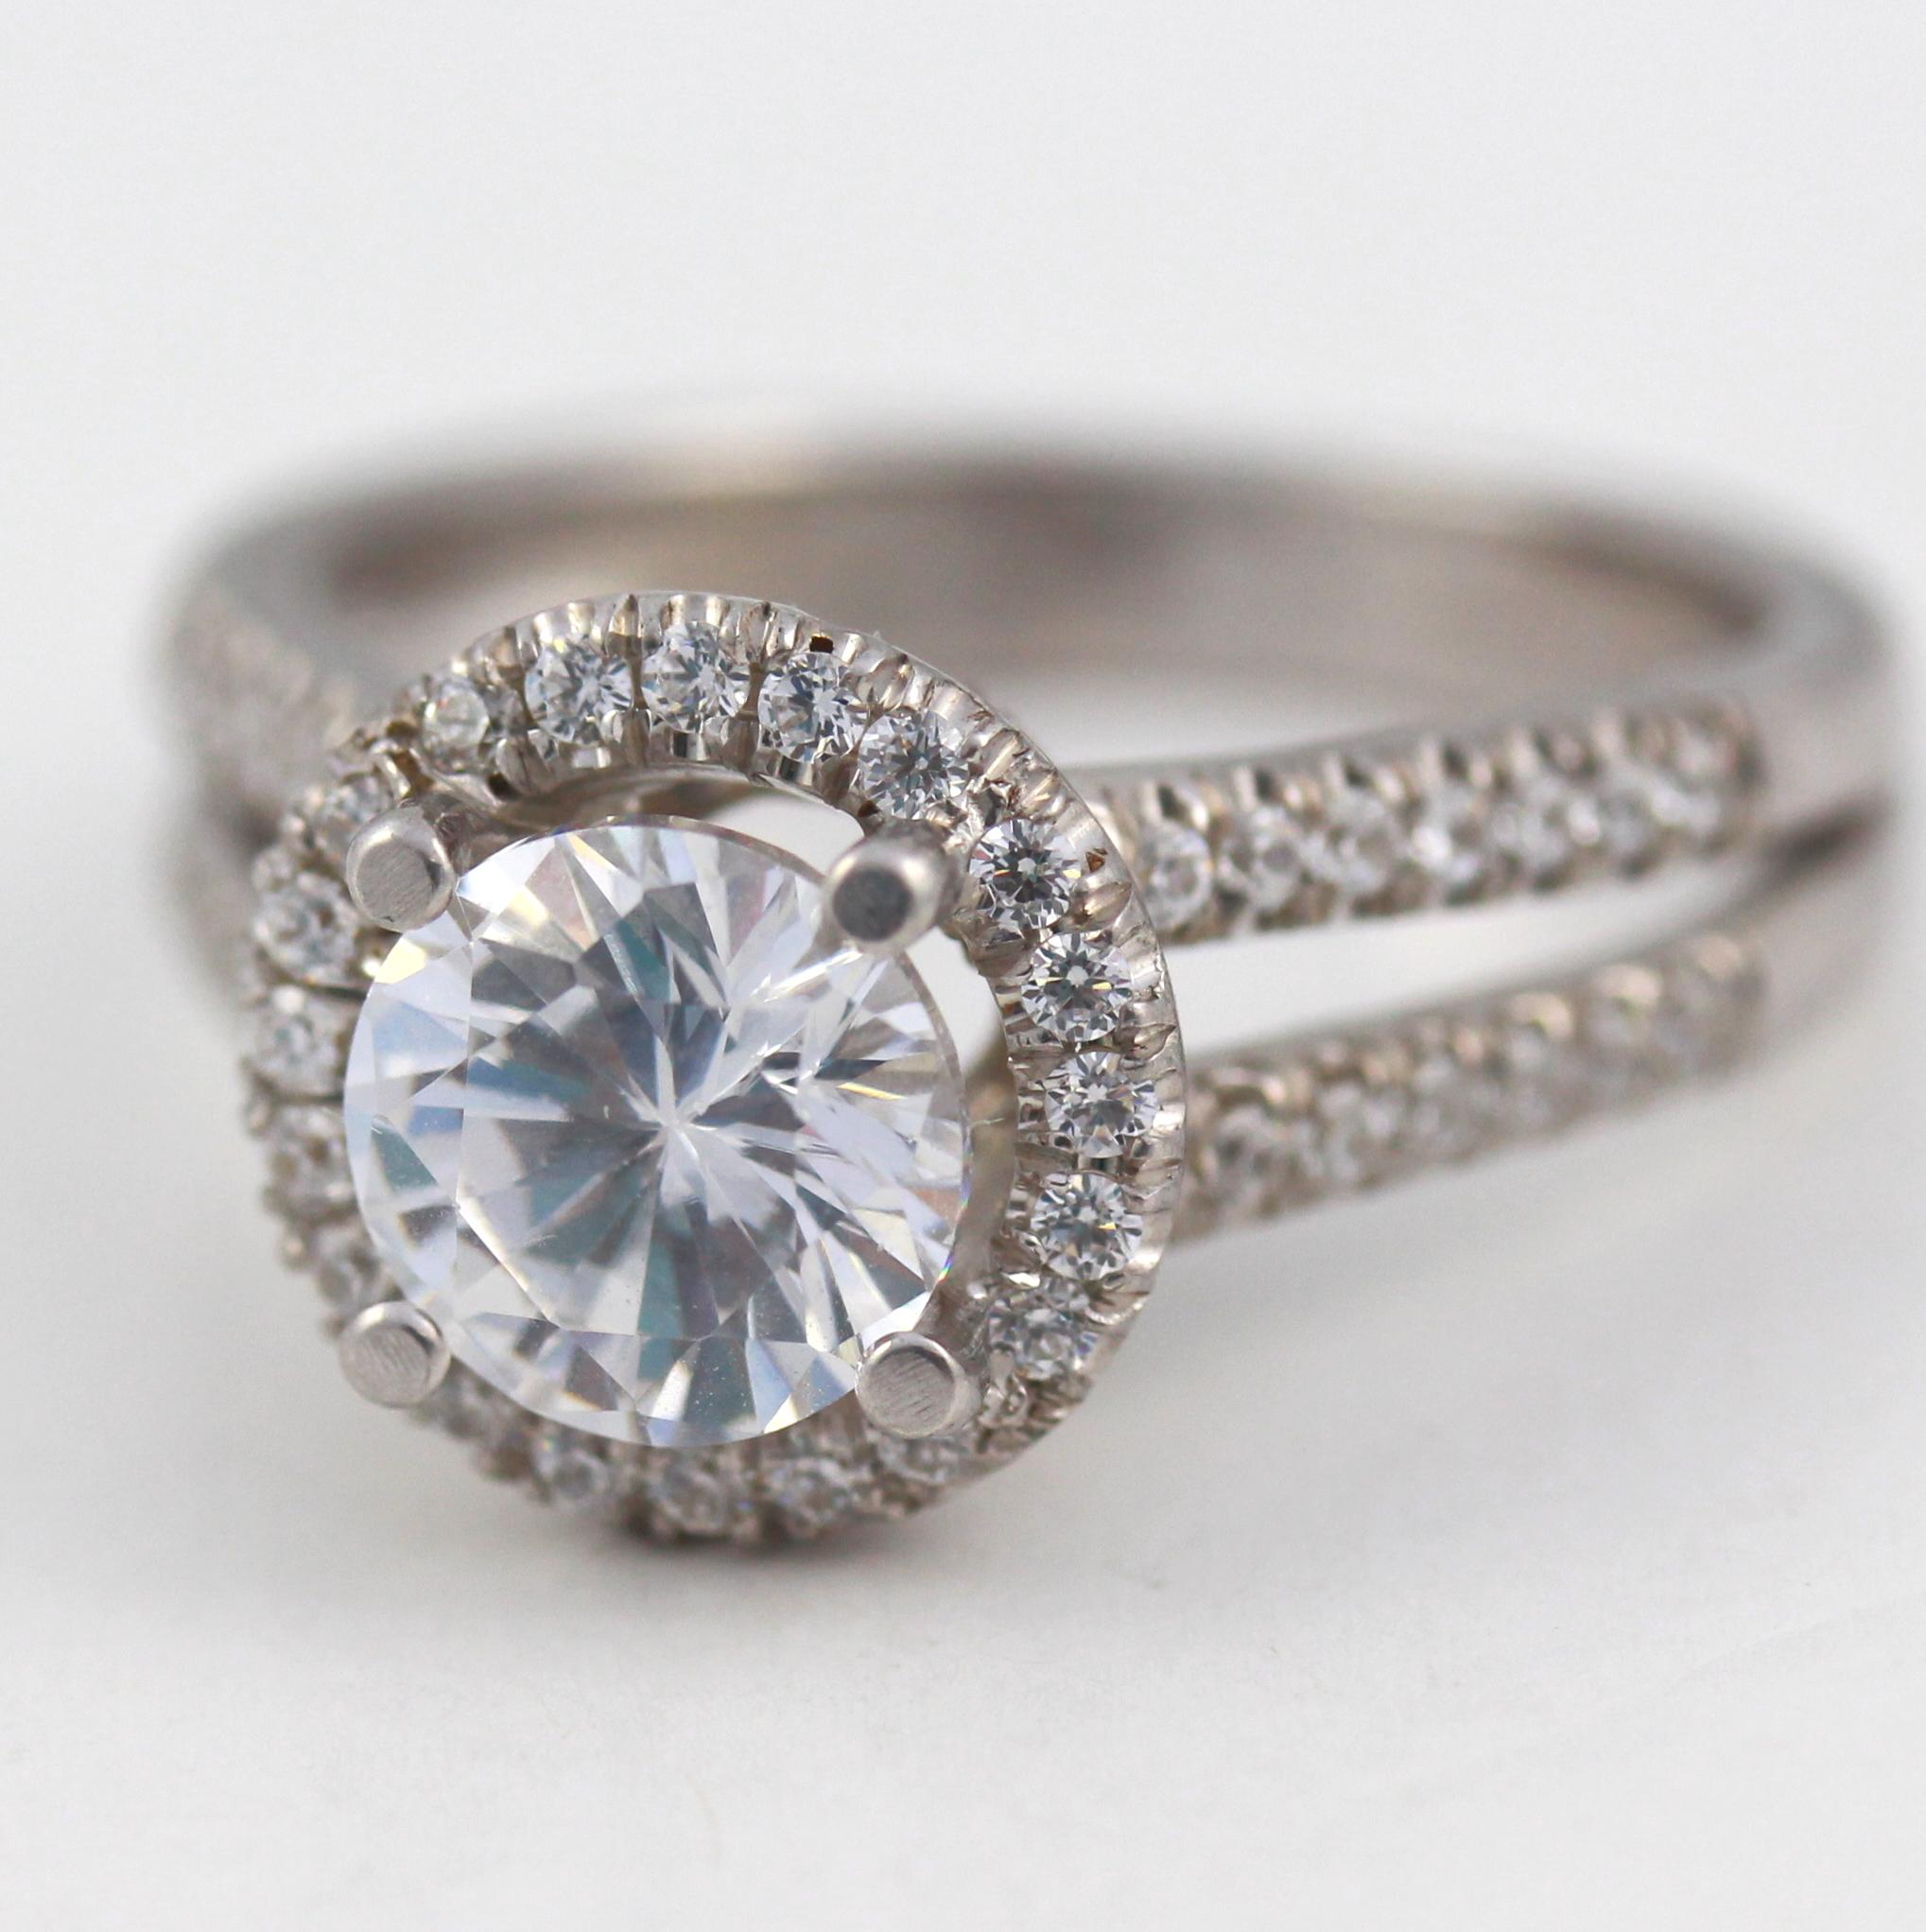 2 2 CT WOMENS 4 PRONG DIAMOND HALO RING 14 KARAT WHITE GOLD REAL SIZE 6 7 8